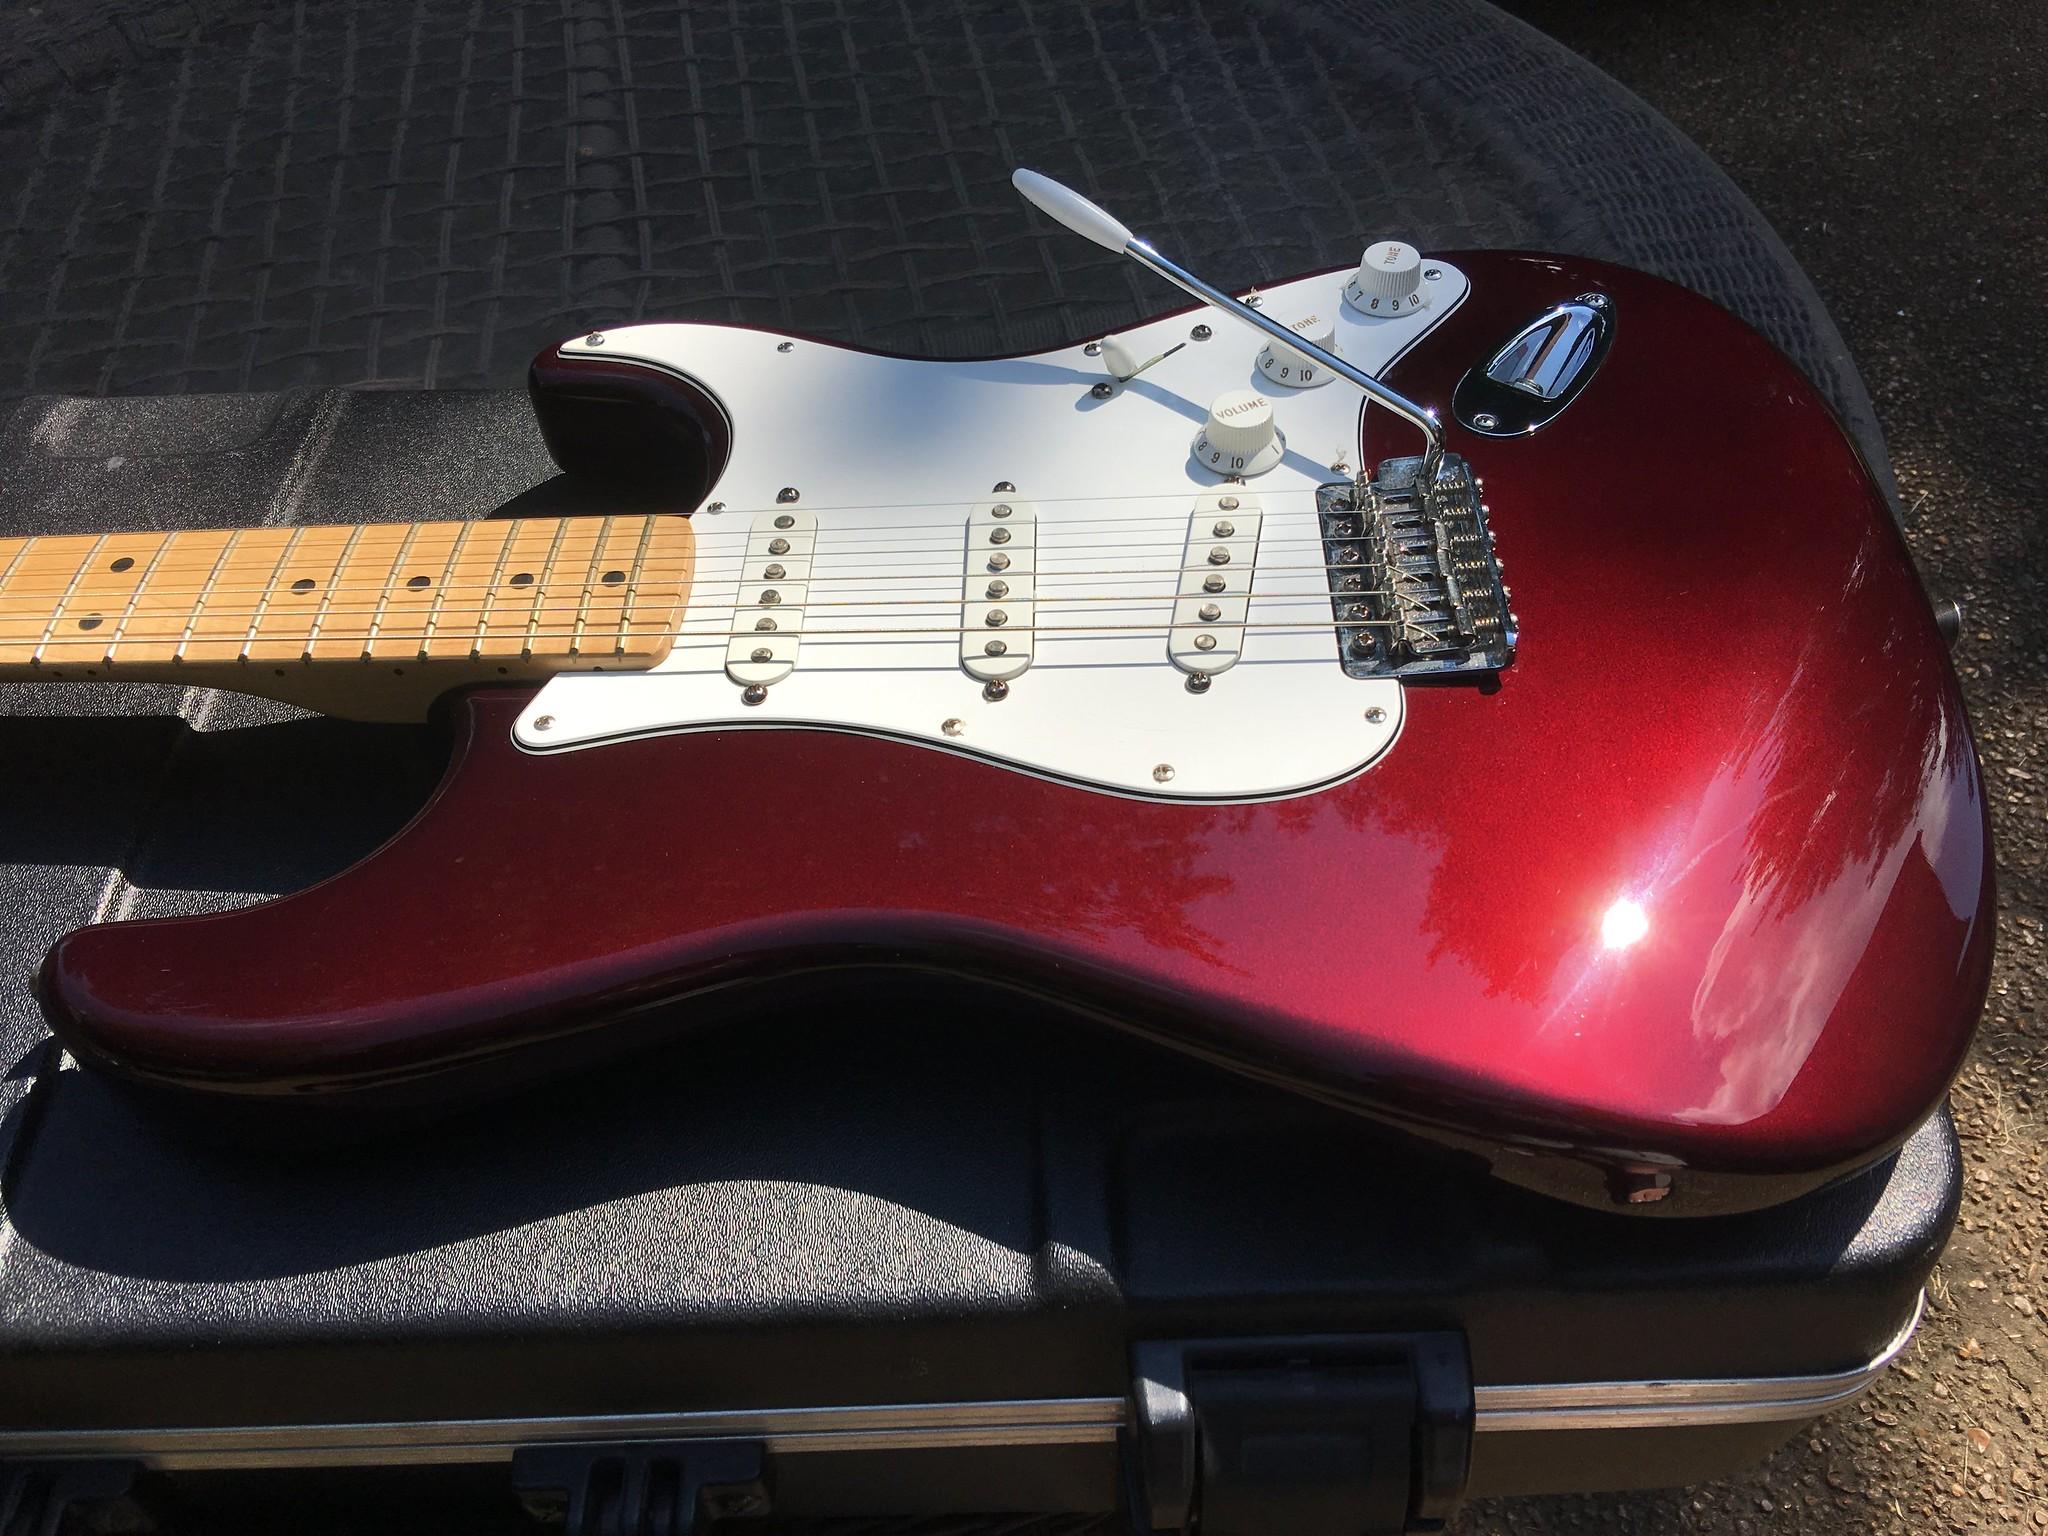 Sold - 2008 Fender Stratocaster (MIM) - Midnight Wine | The